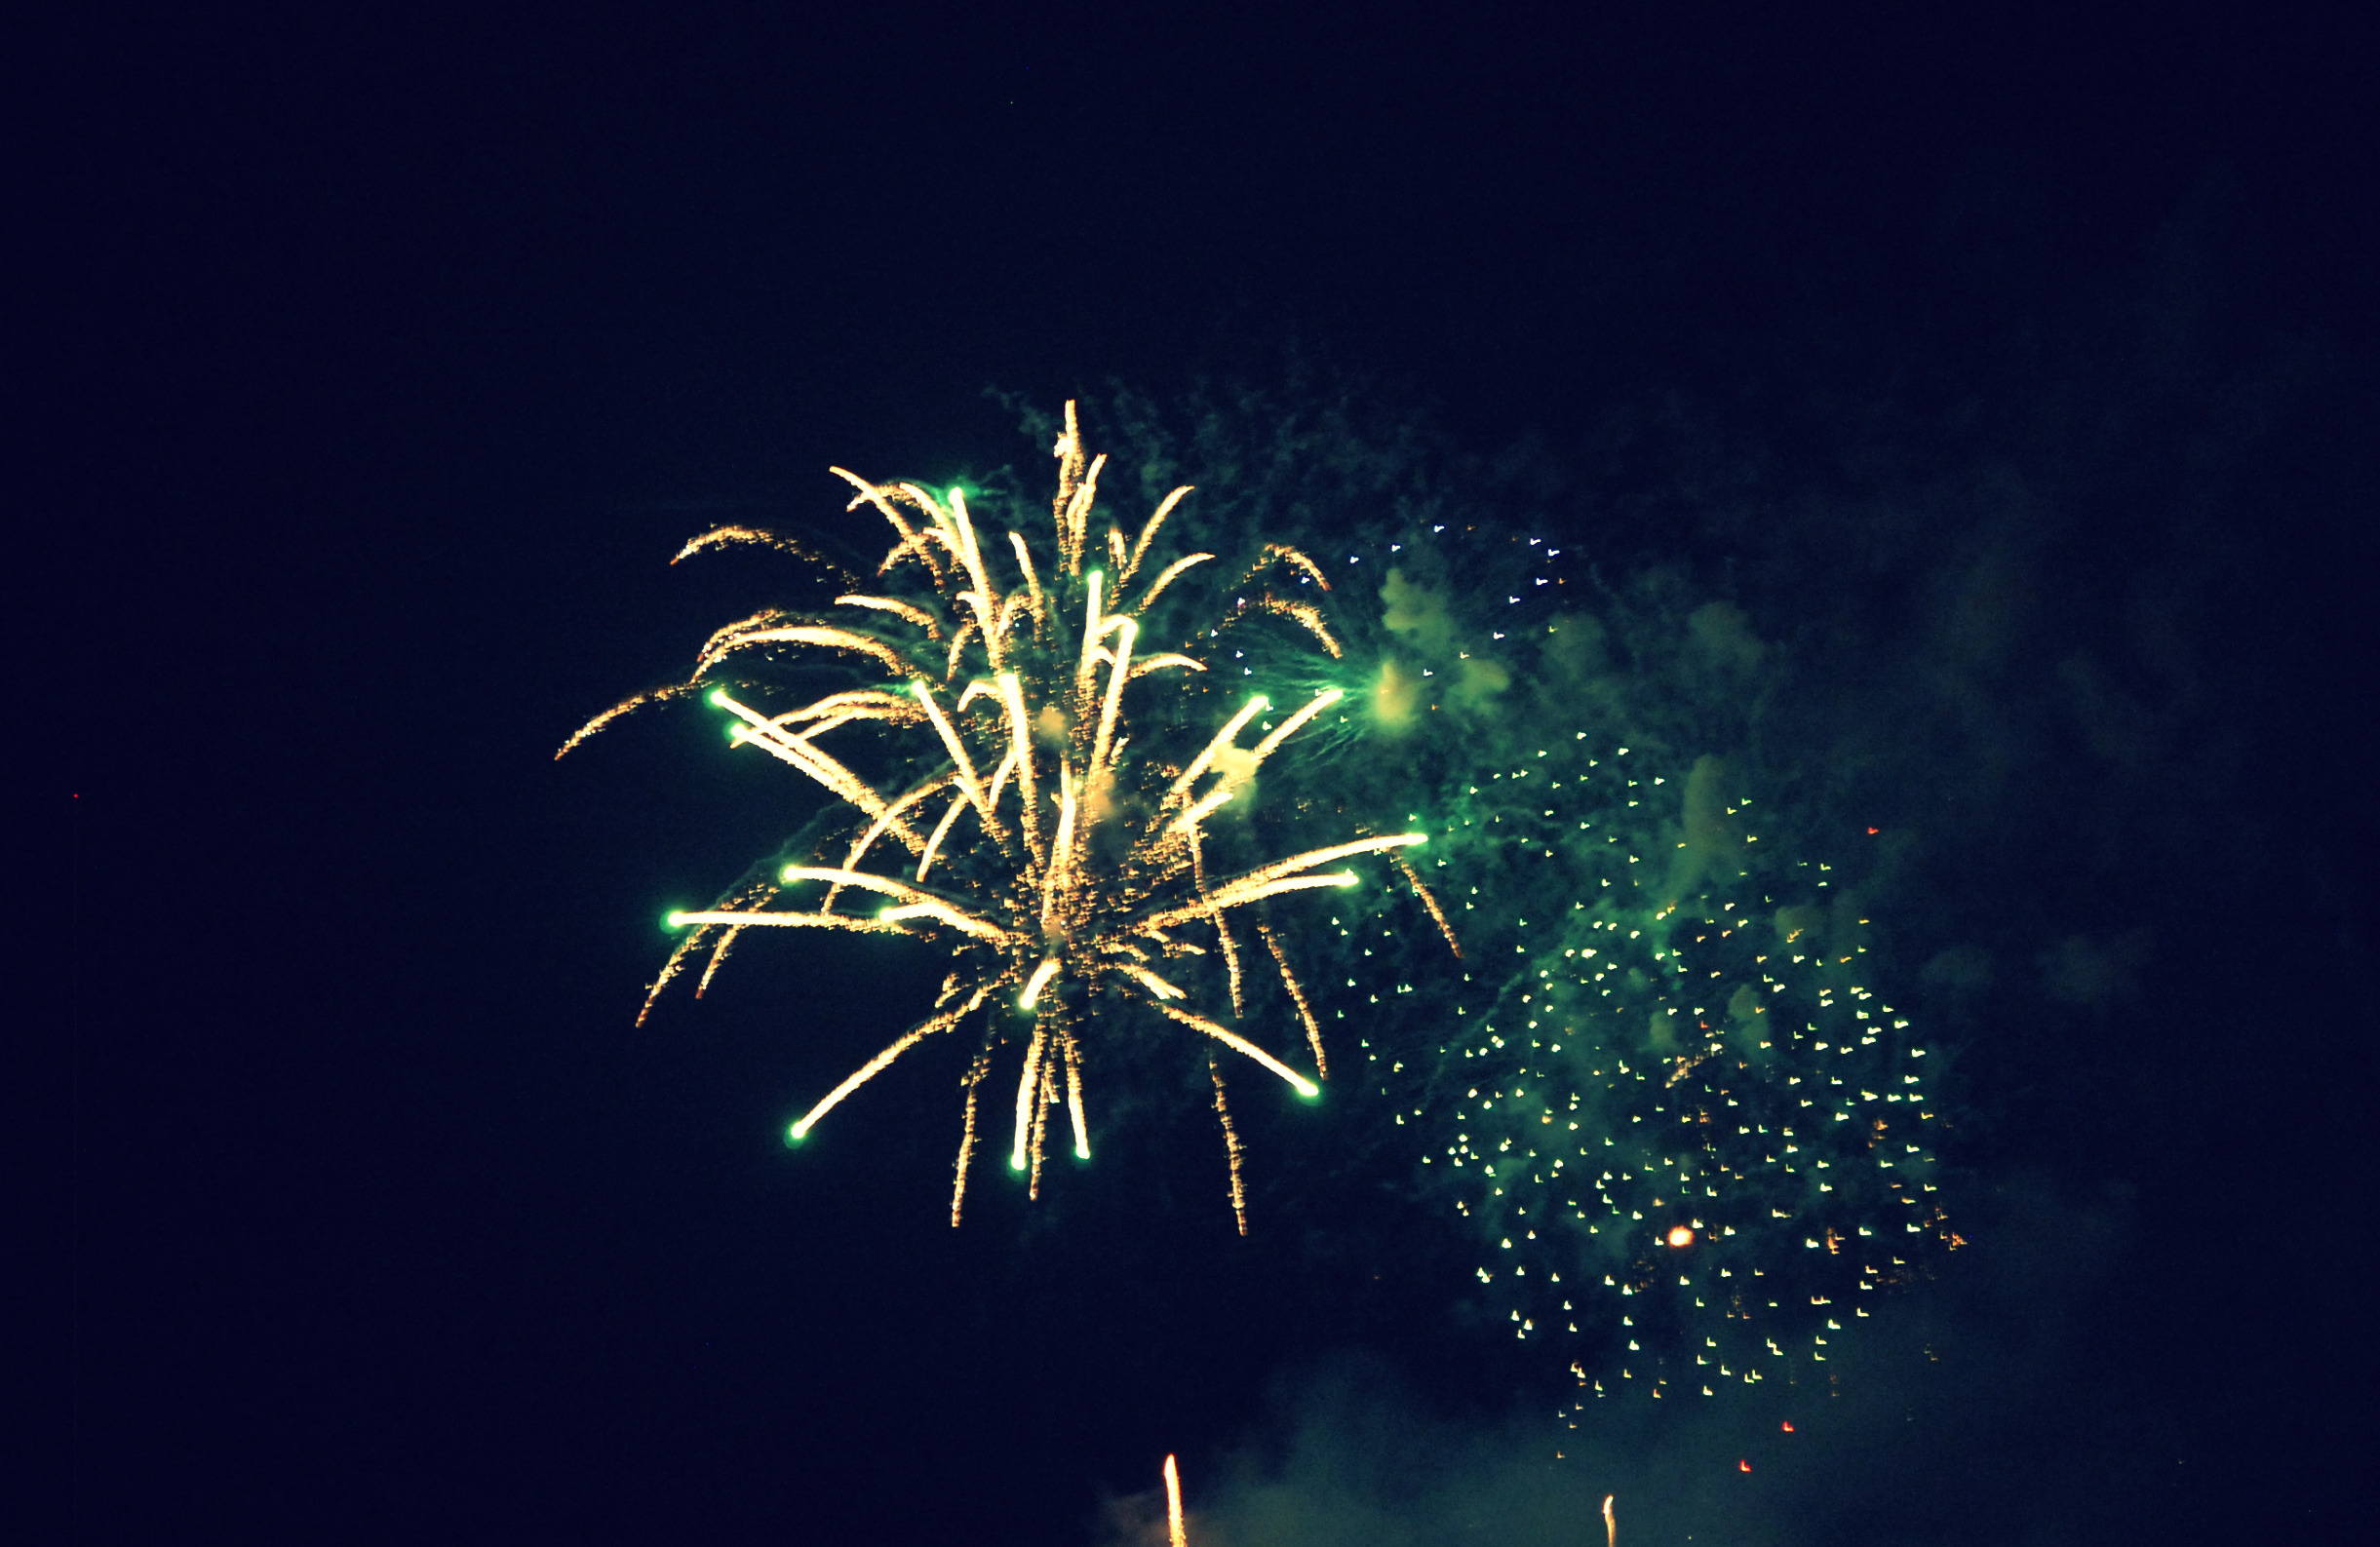 There Will Be Fireworks - There Will Be Fireworks